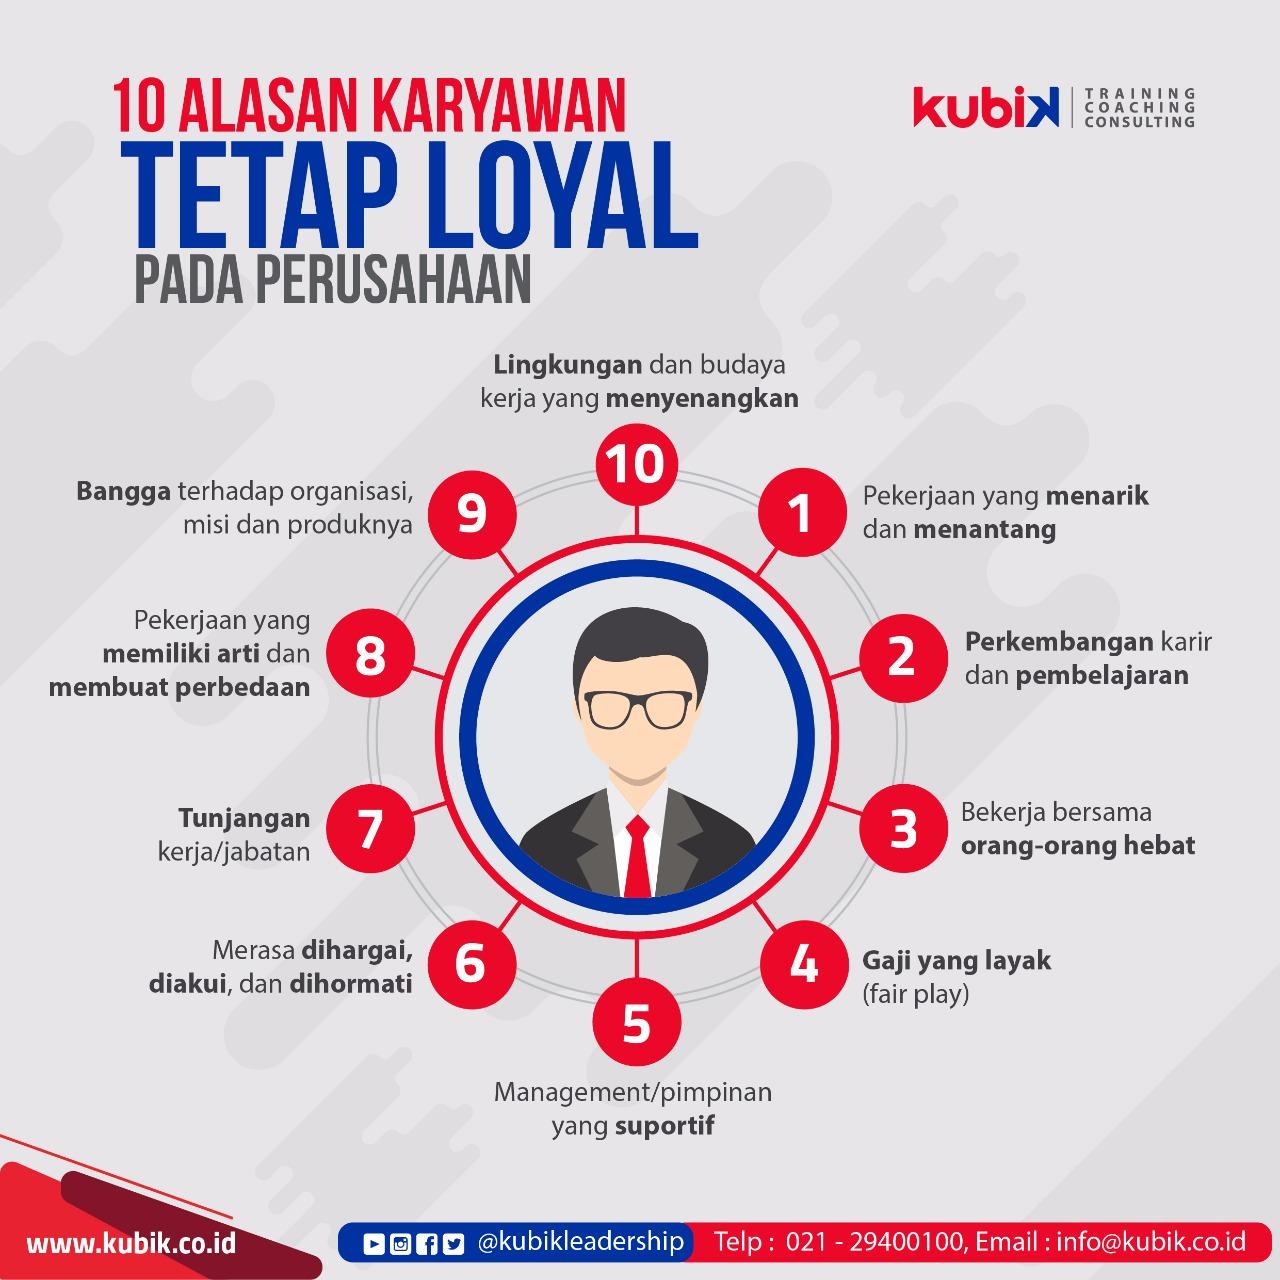 10 Alasan Karyawan Tetap Loyal Pada Perusahaan